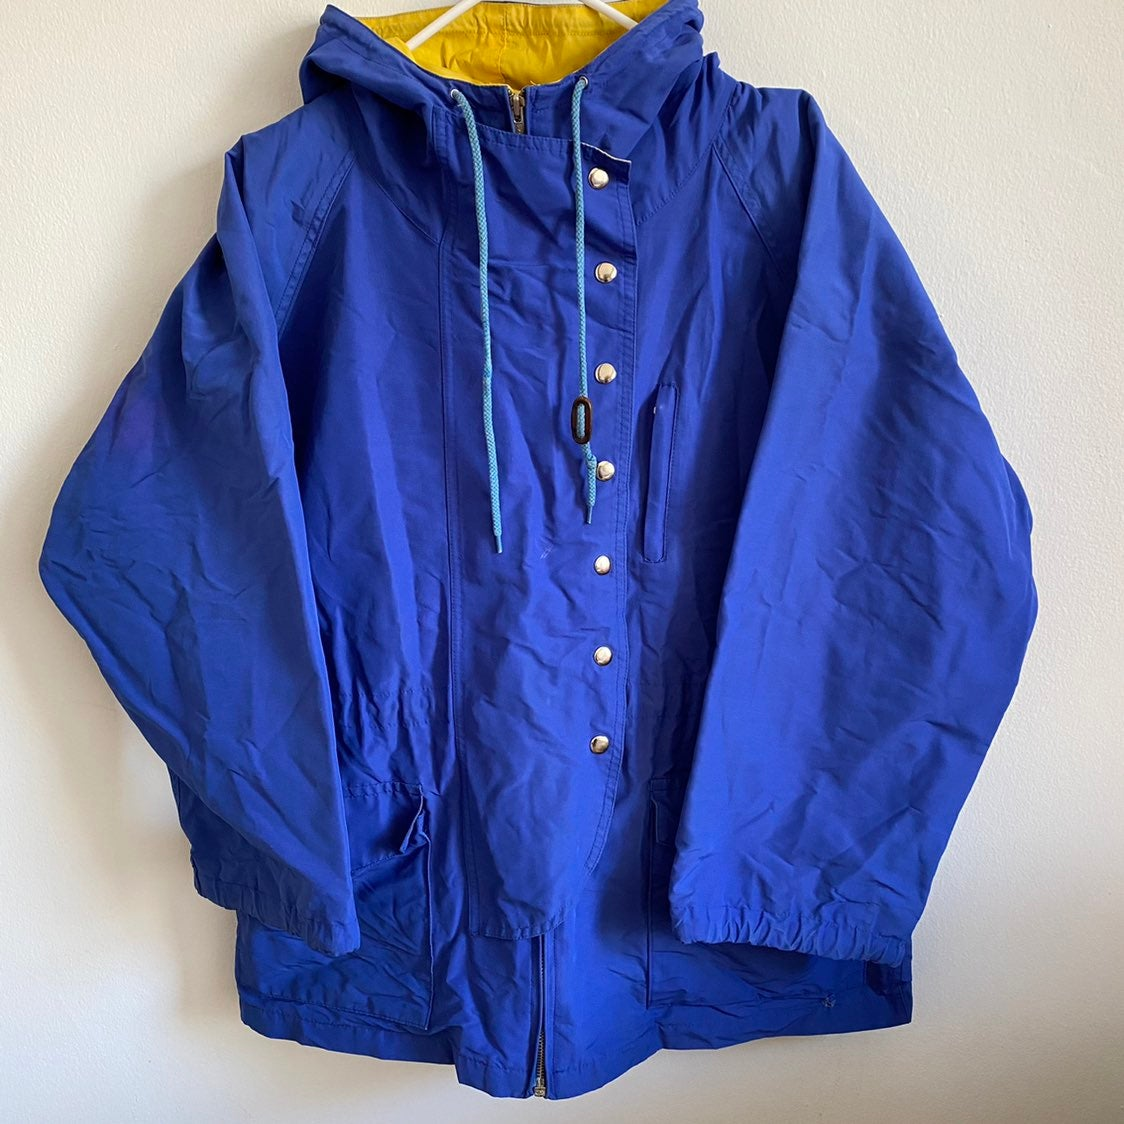 Ralph Lauren Windbreaker Parka Jacket